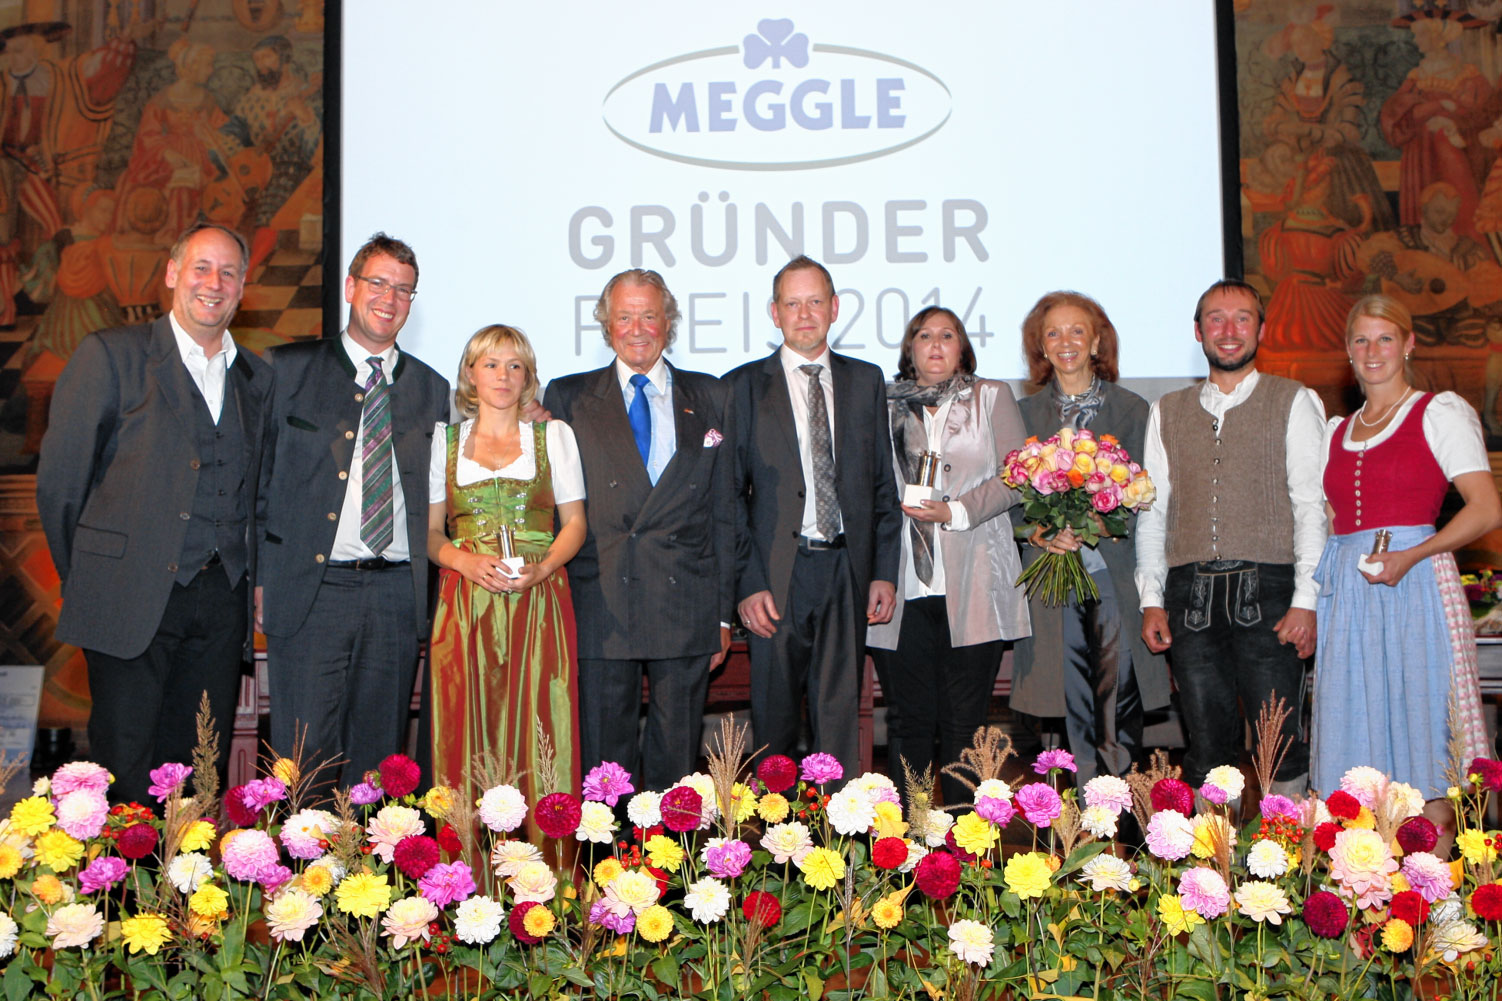 Dritter MEGGLE-Gründerpreis wurde vergeben